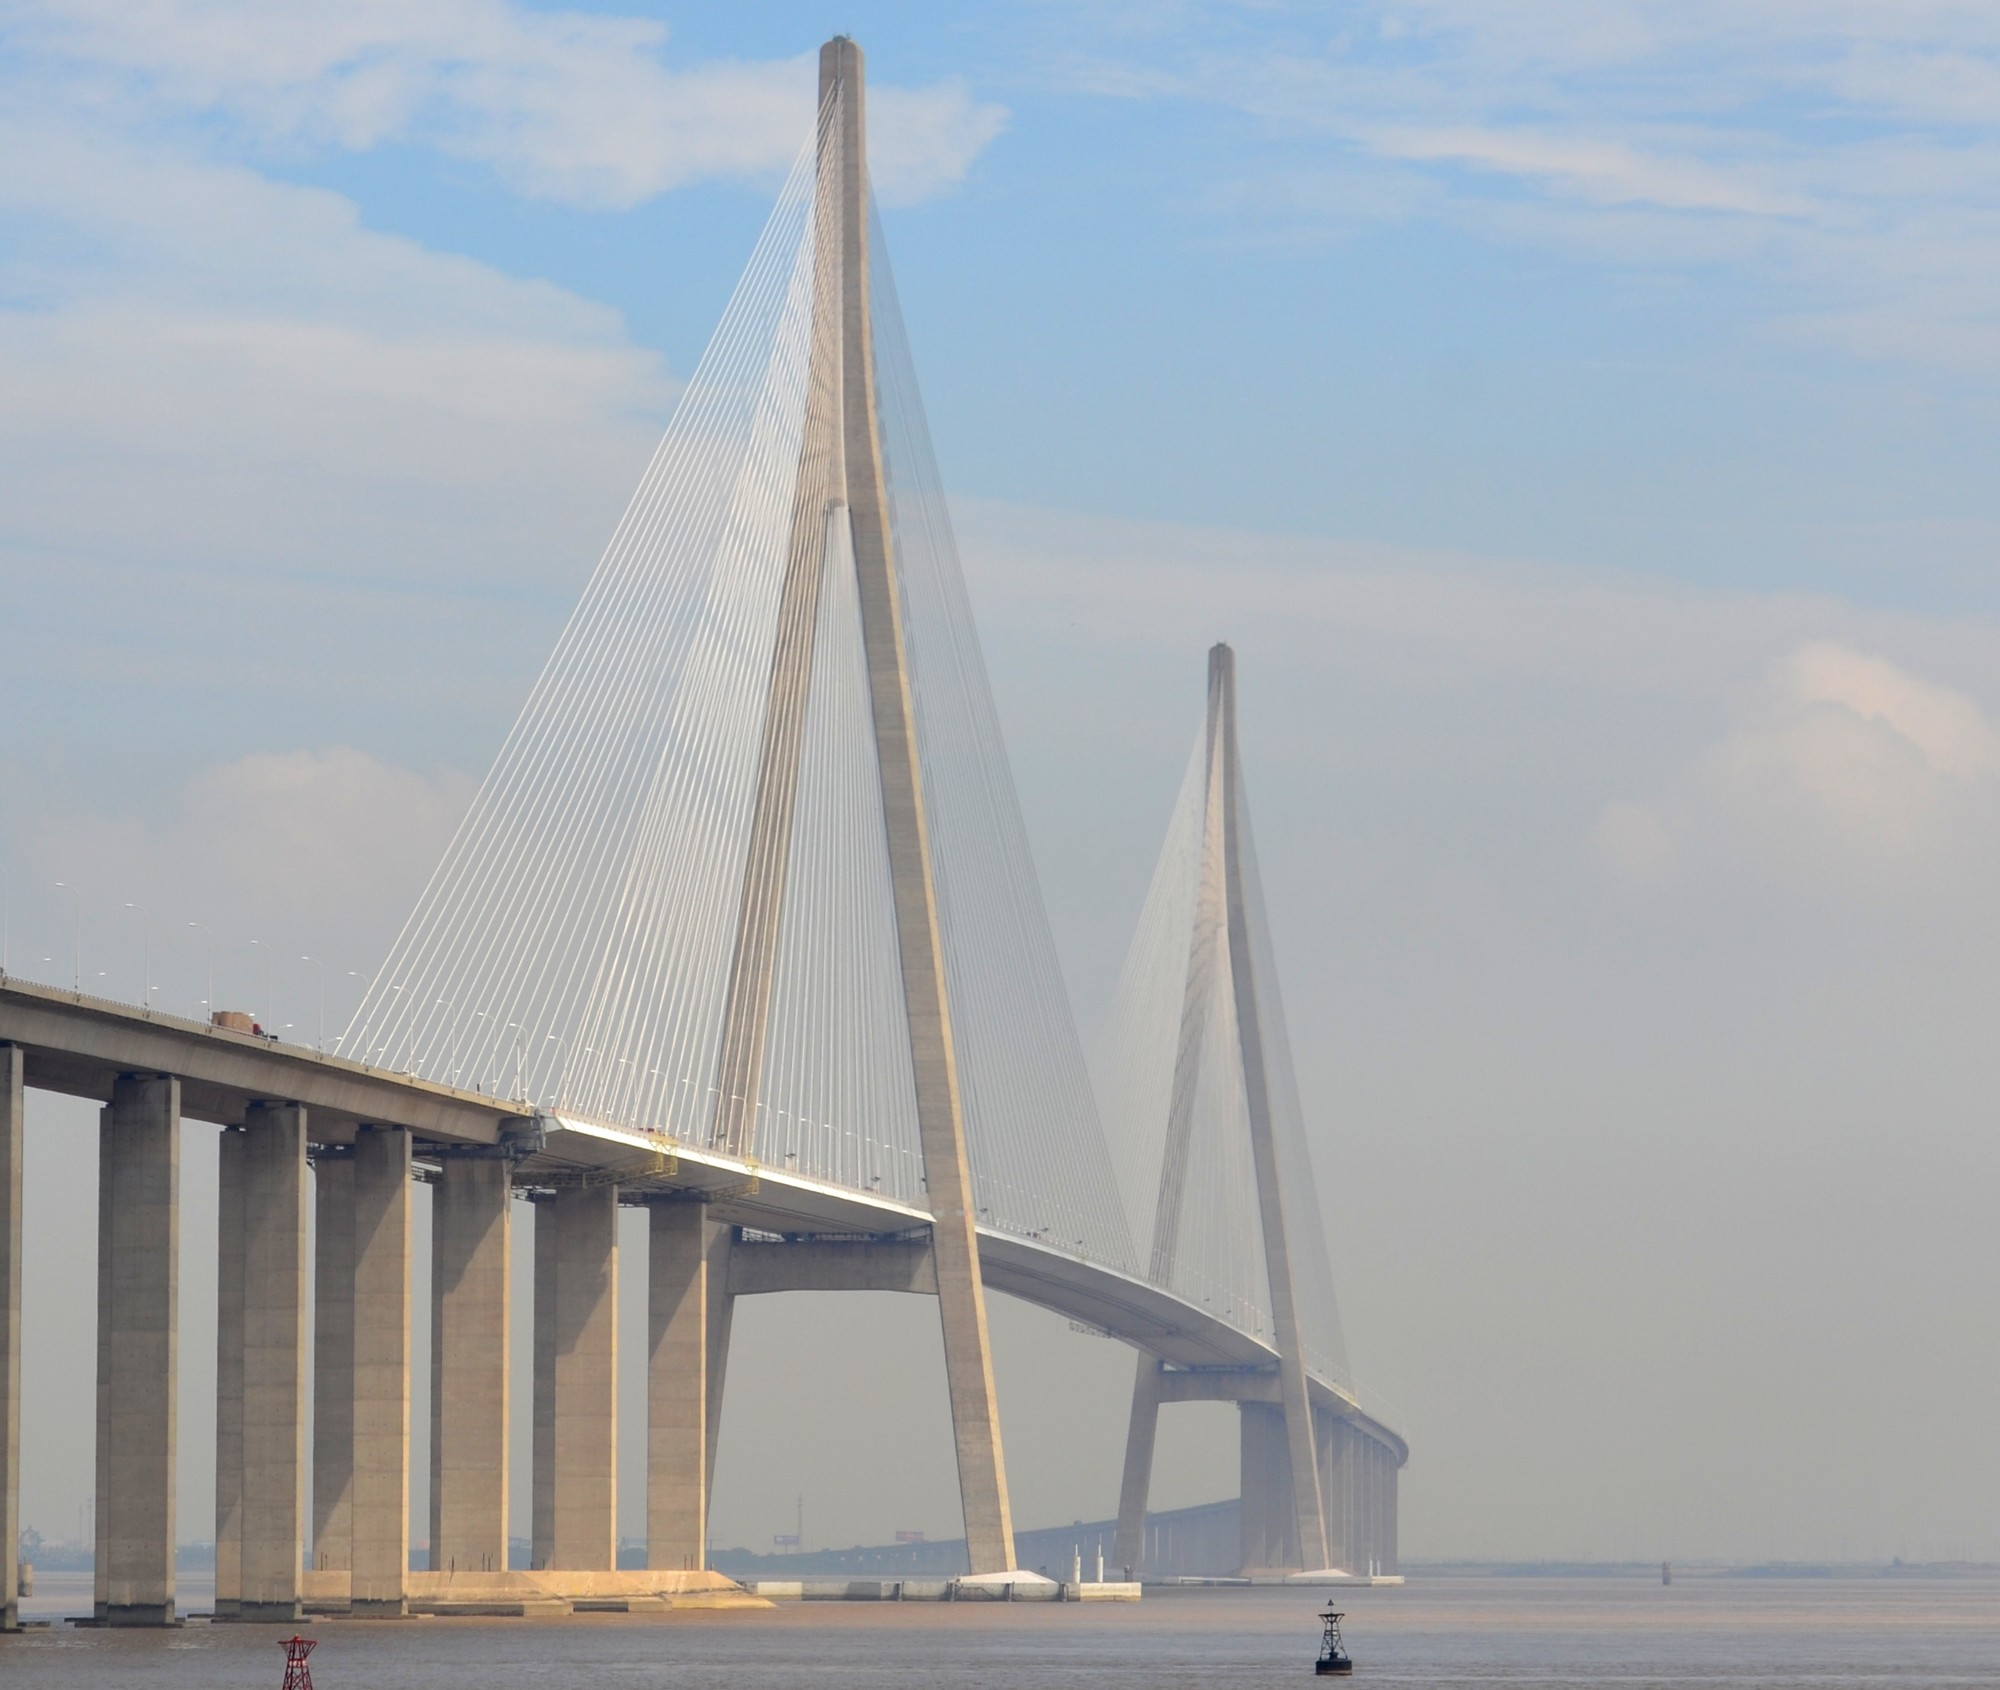 File:Sutong Yangtze River Bridge.JPG - Wikimedia Commons